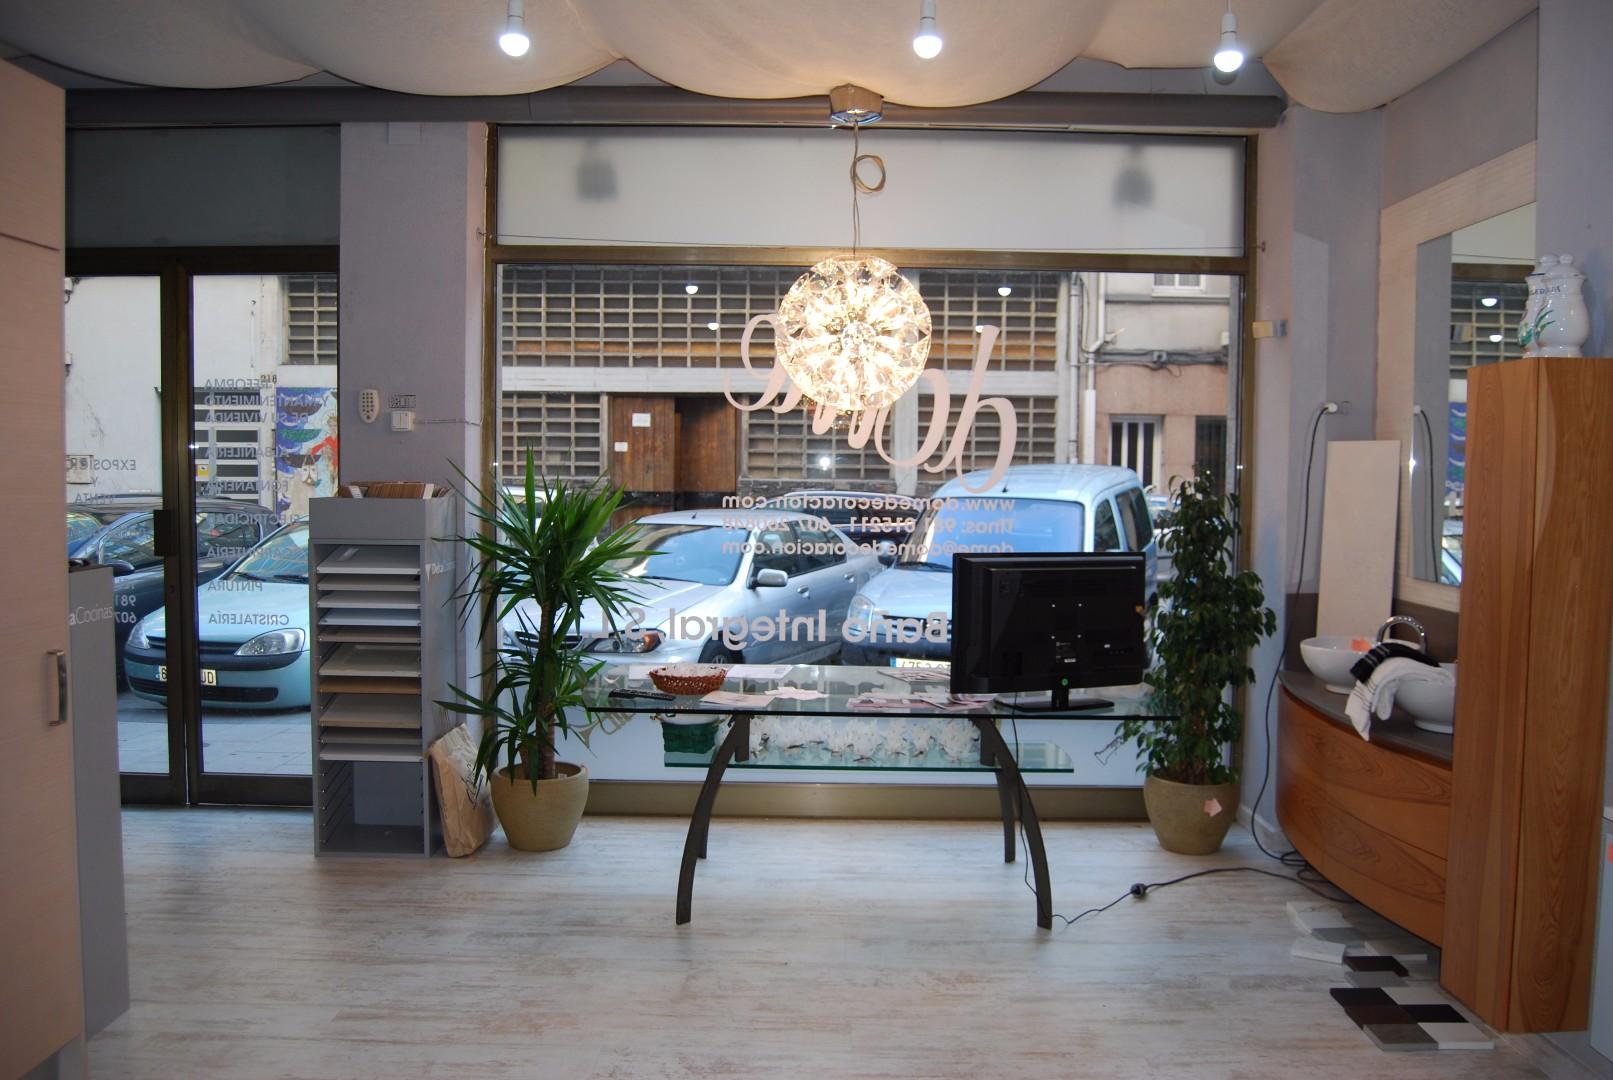 Local comercial en venta en A Coruña